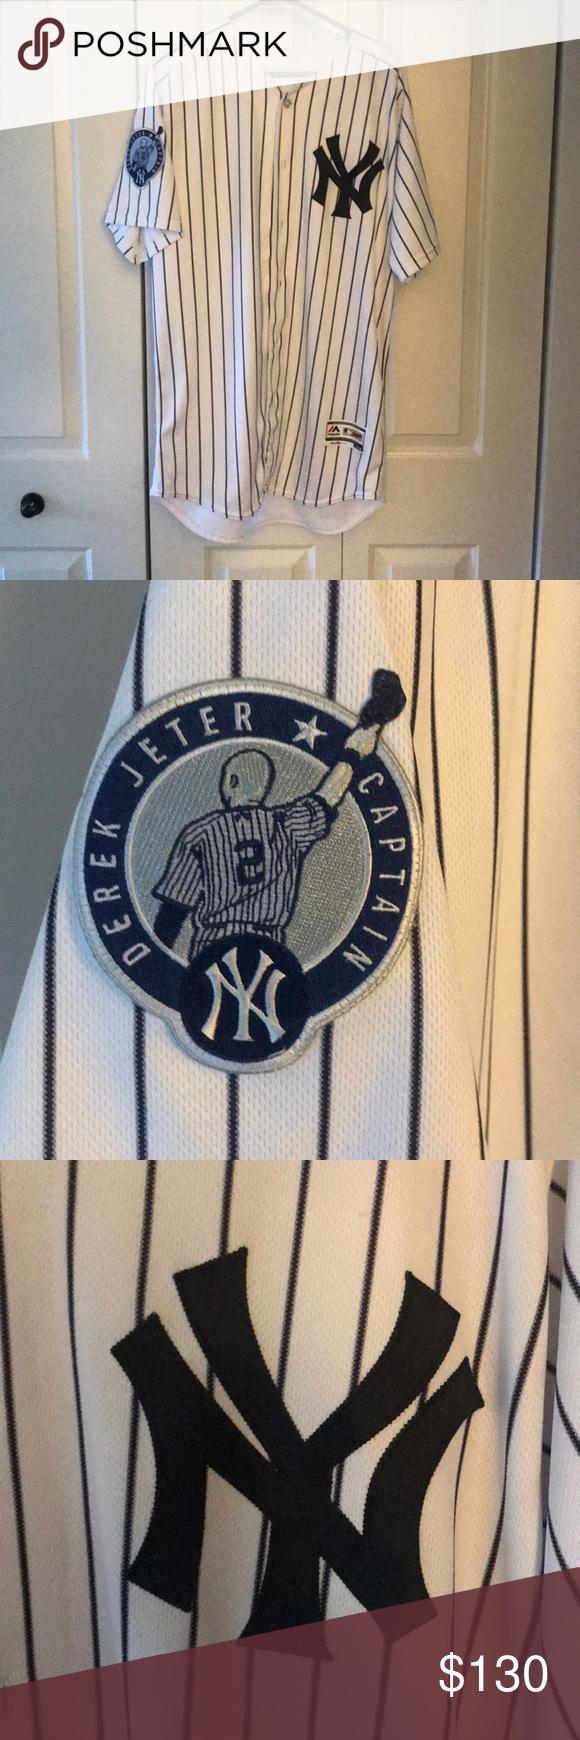 New York Yankees Derek Jeter Captain Patch Jersey Derek Jeter New York Yankees Buster Posey